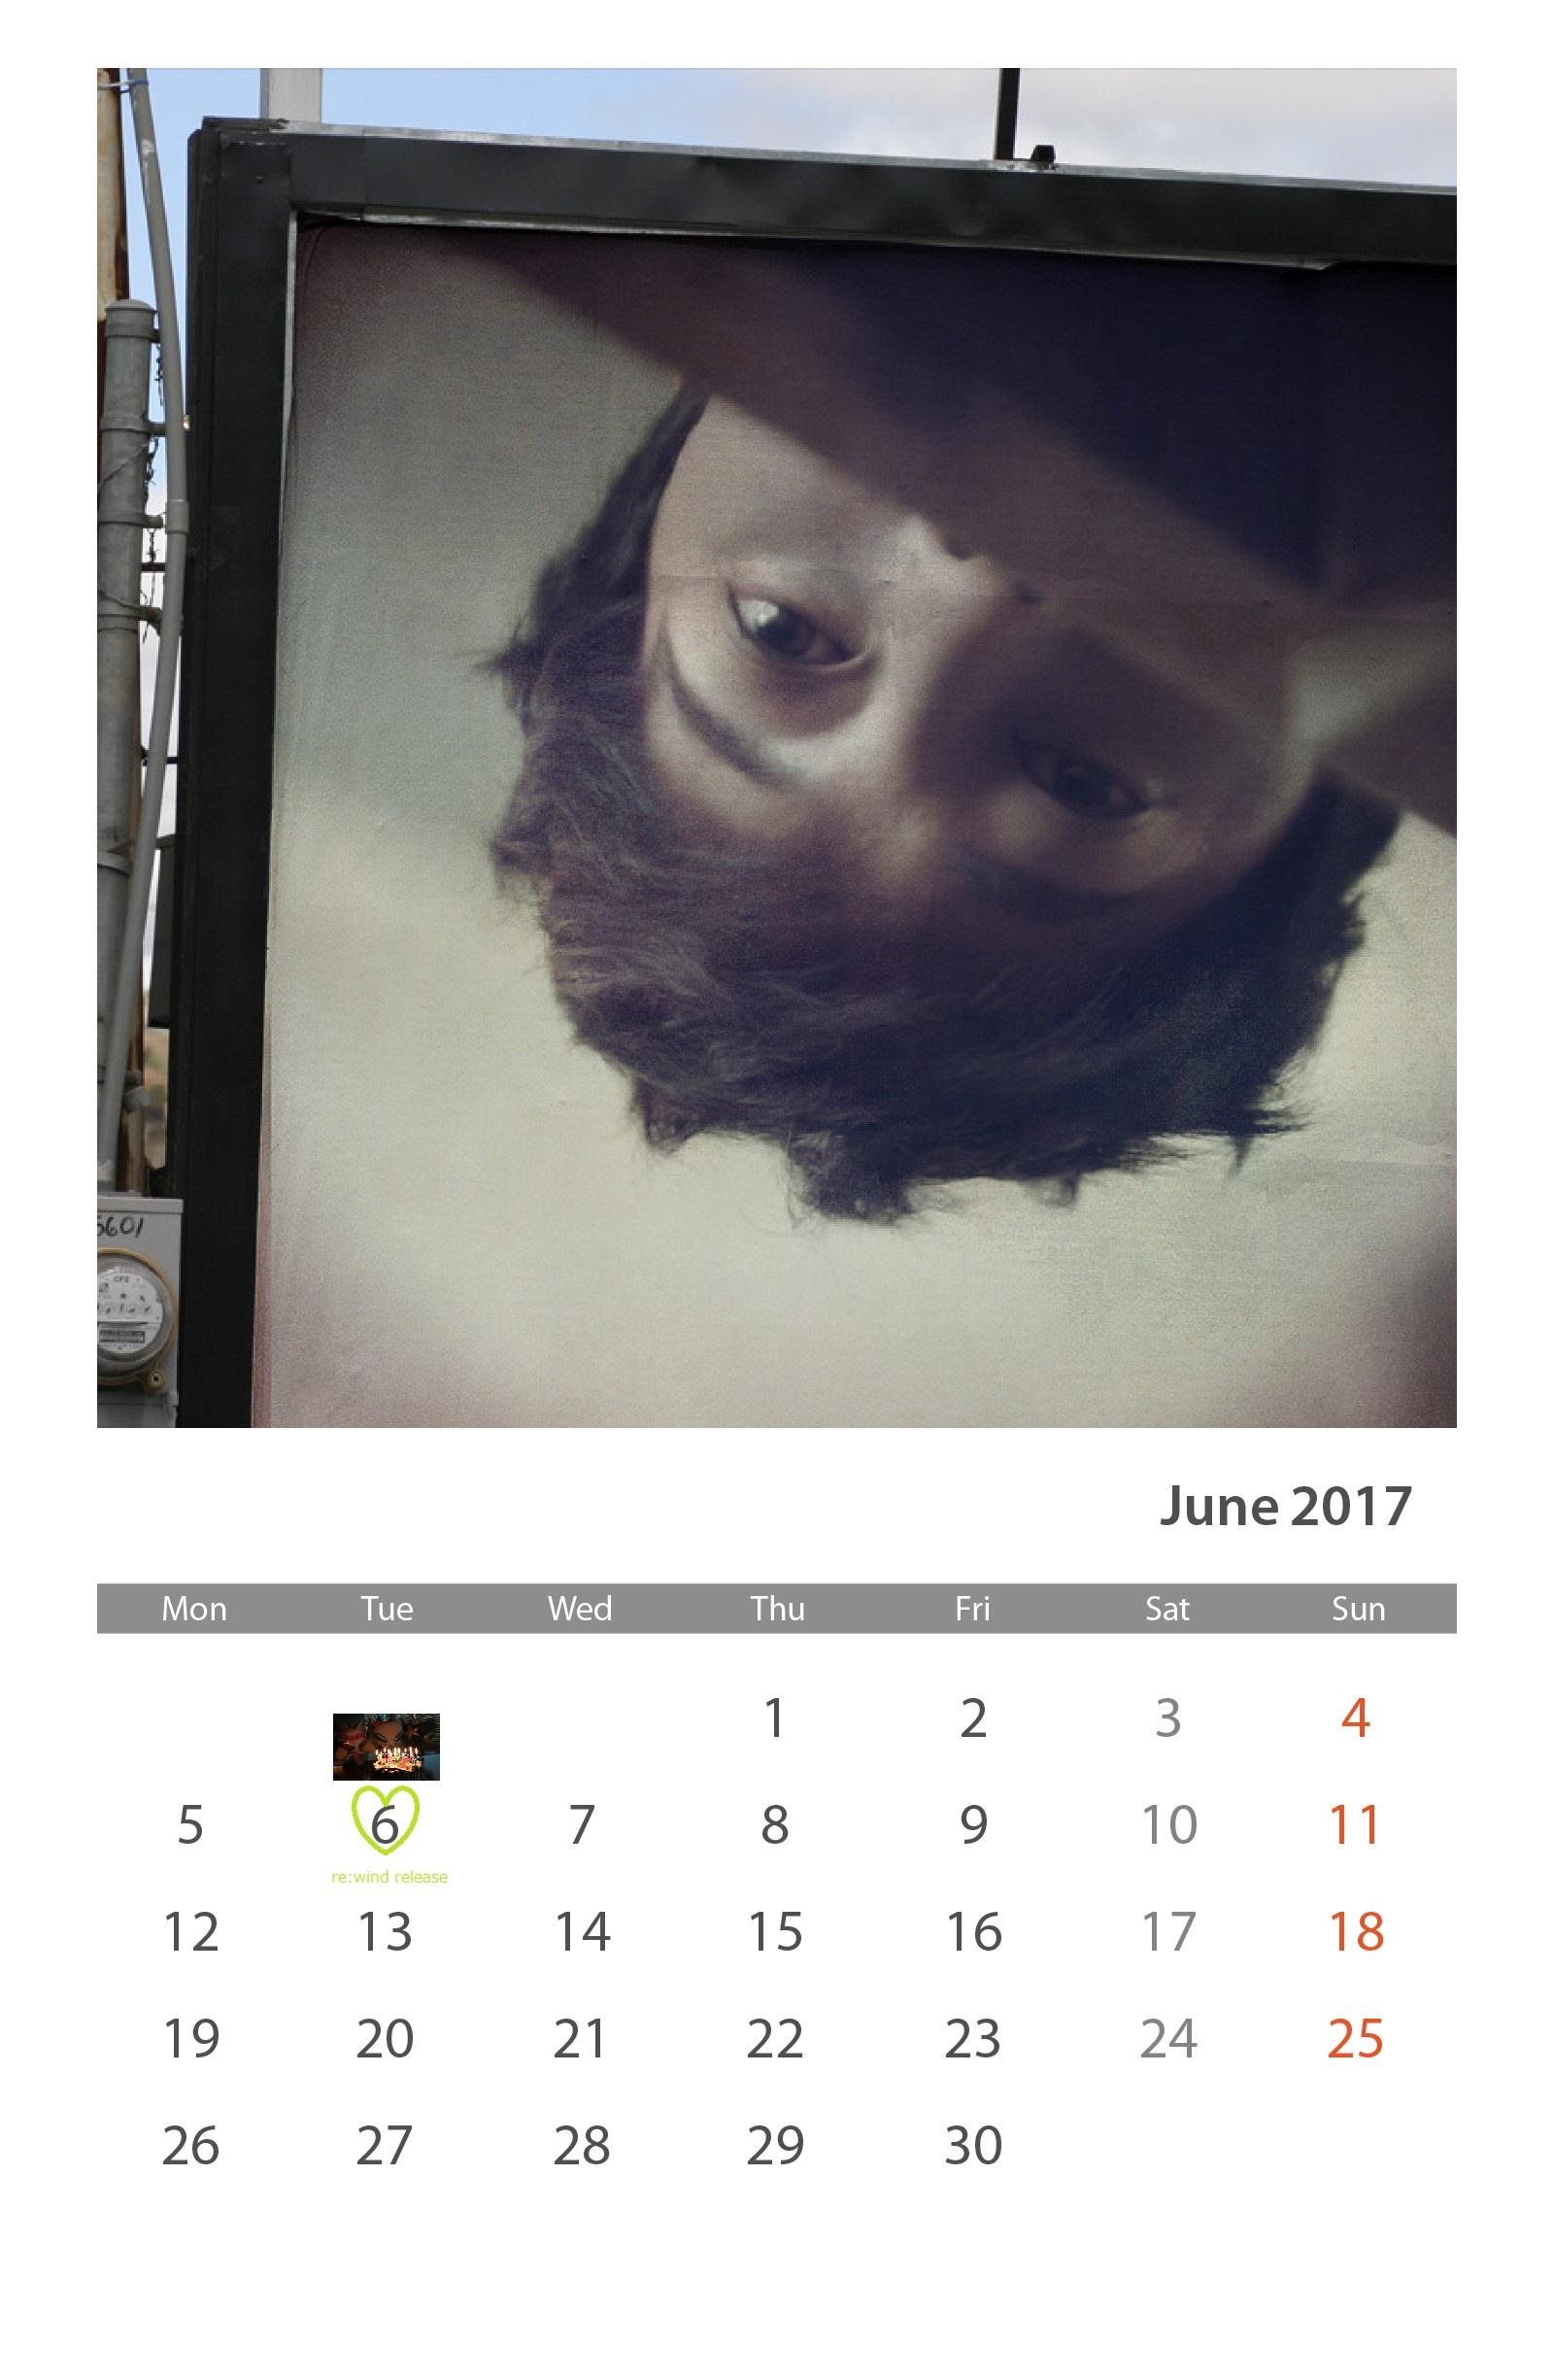 Calendar of June 2017 - Happy Birthday KHJ